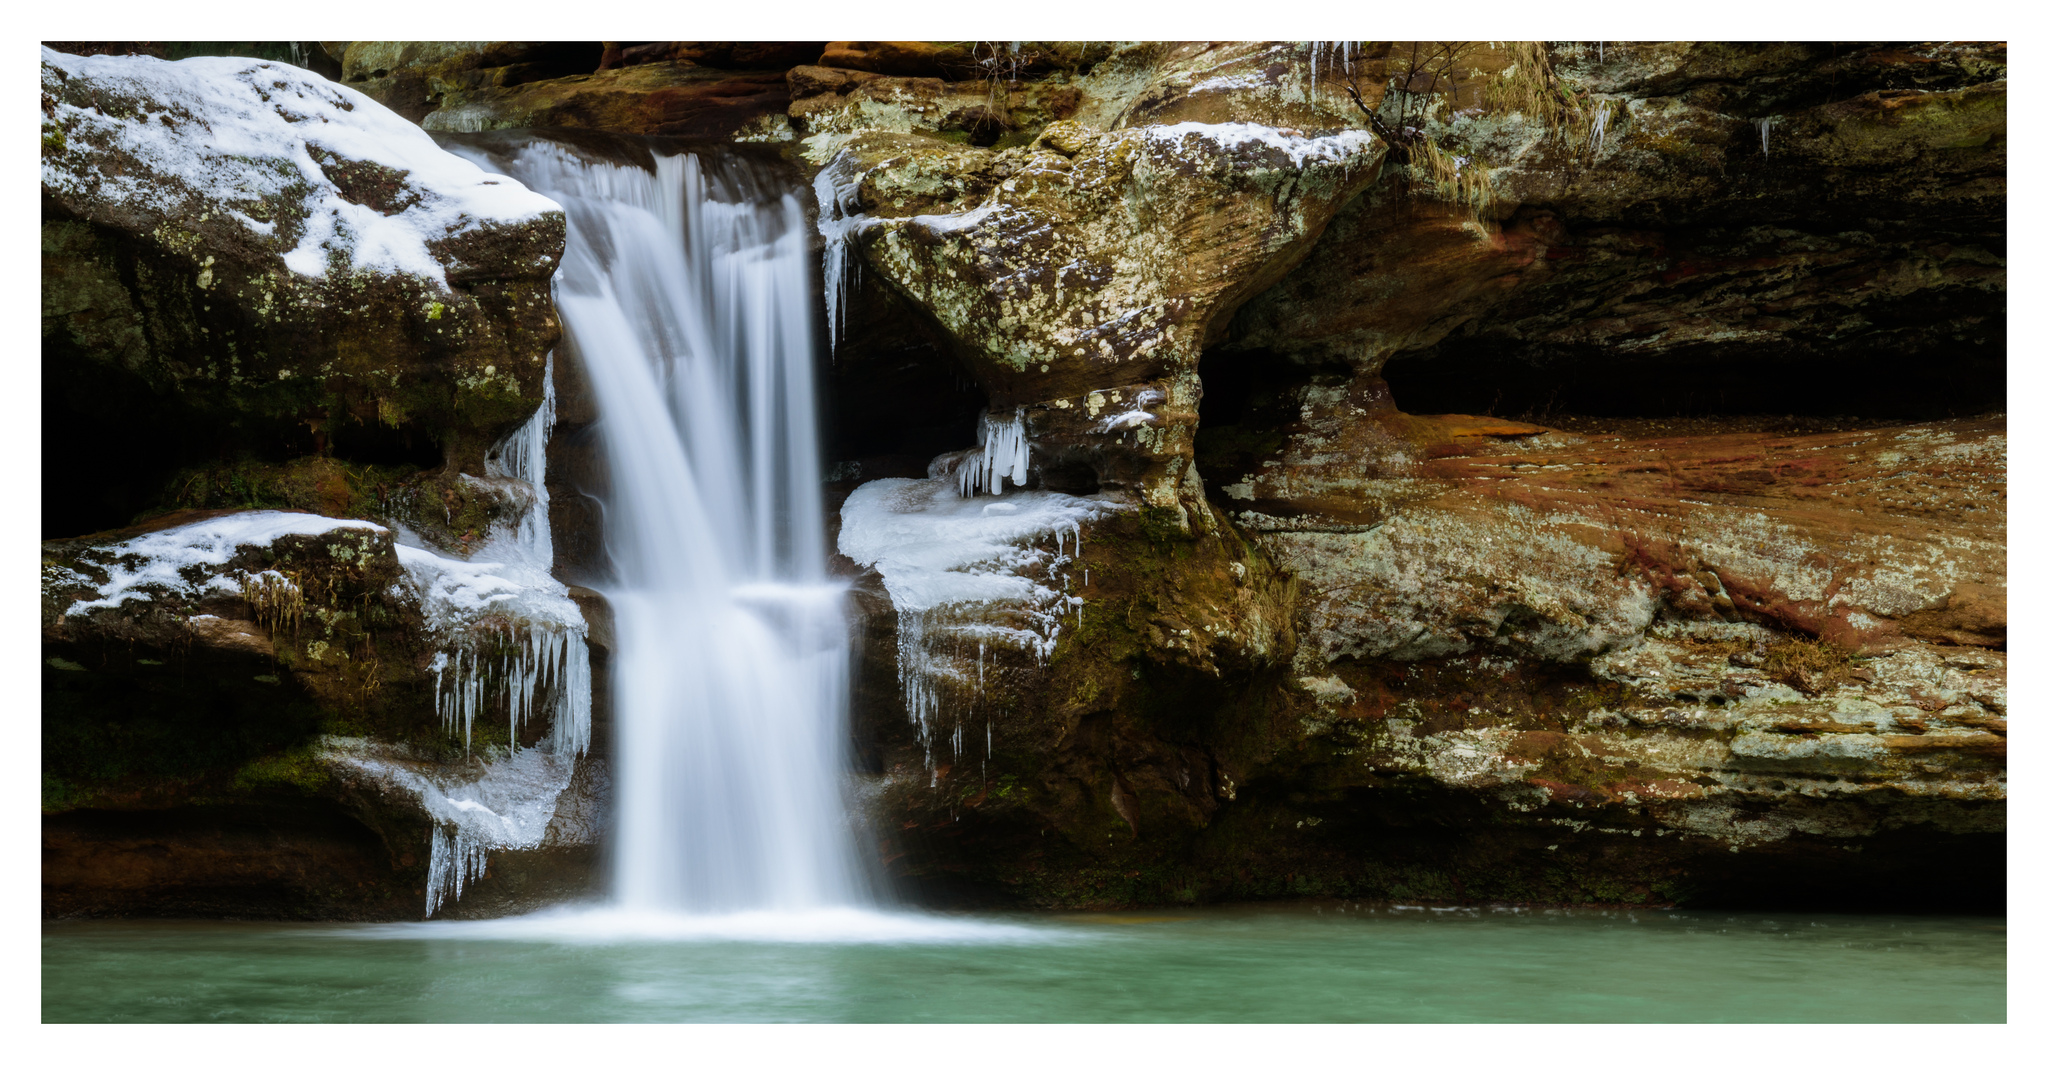 Upper Falls - Digital Pano Stitch